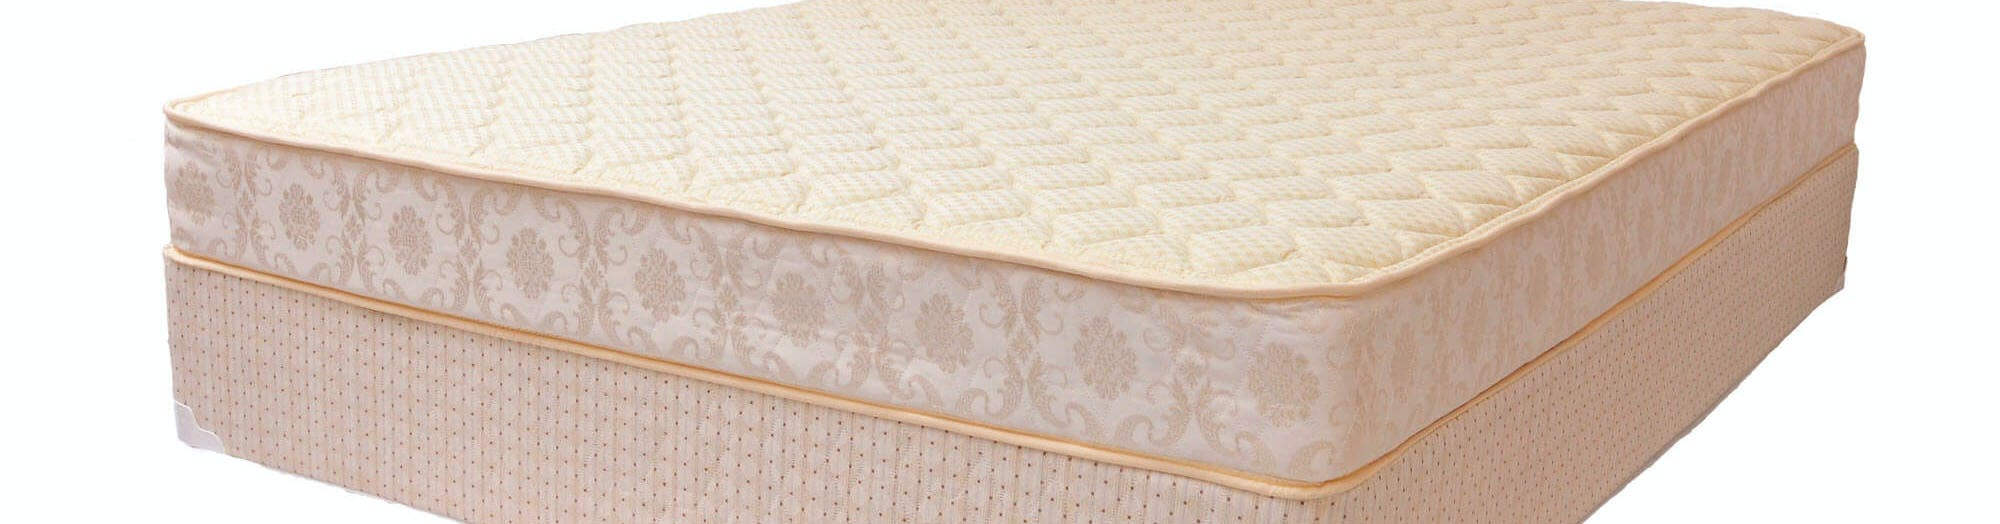 shop for corsicana mattresses in cincinnati and dayton oh